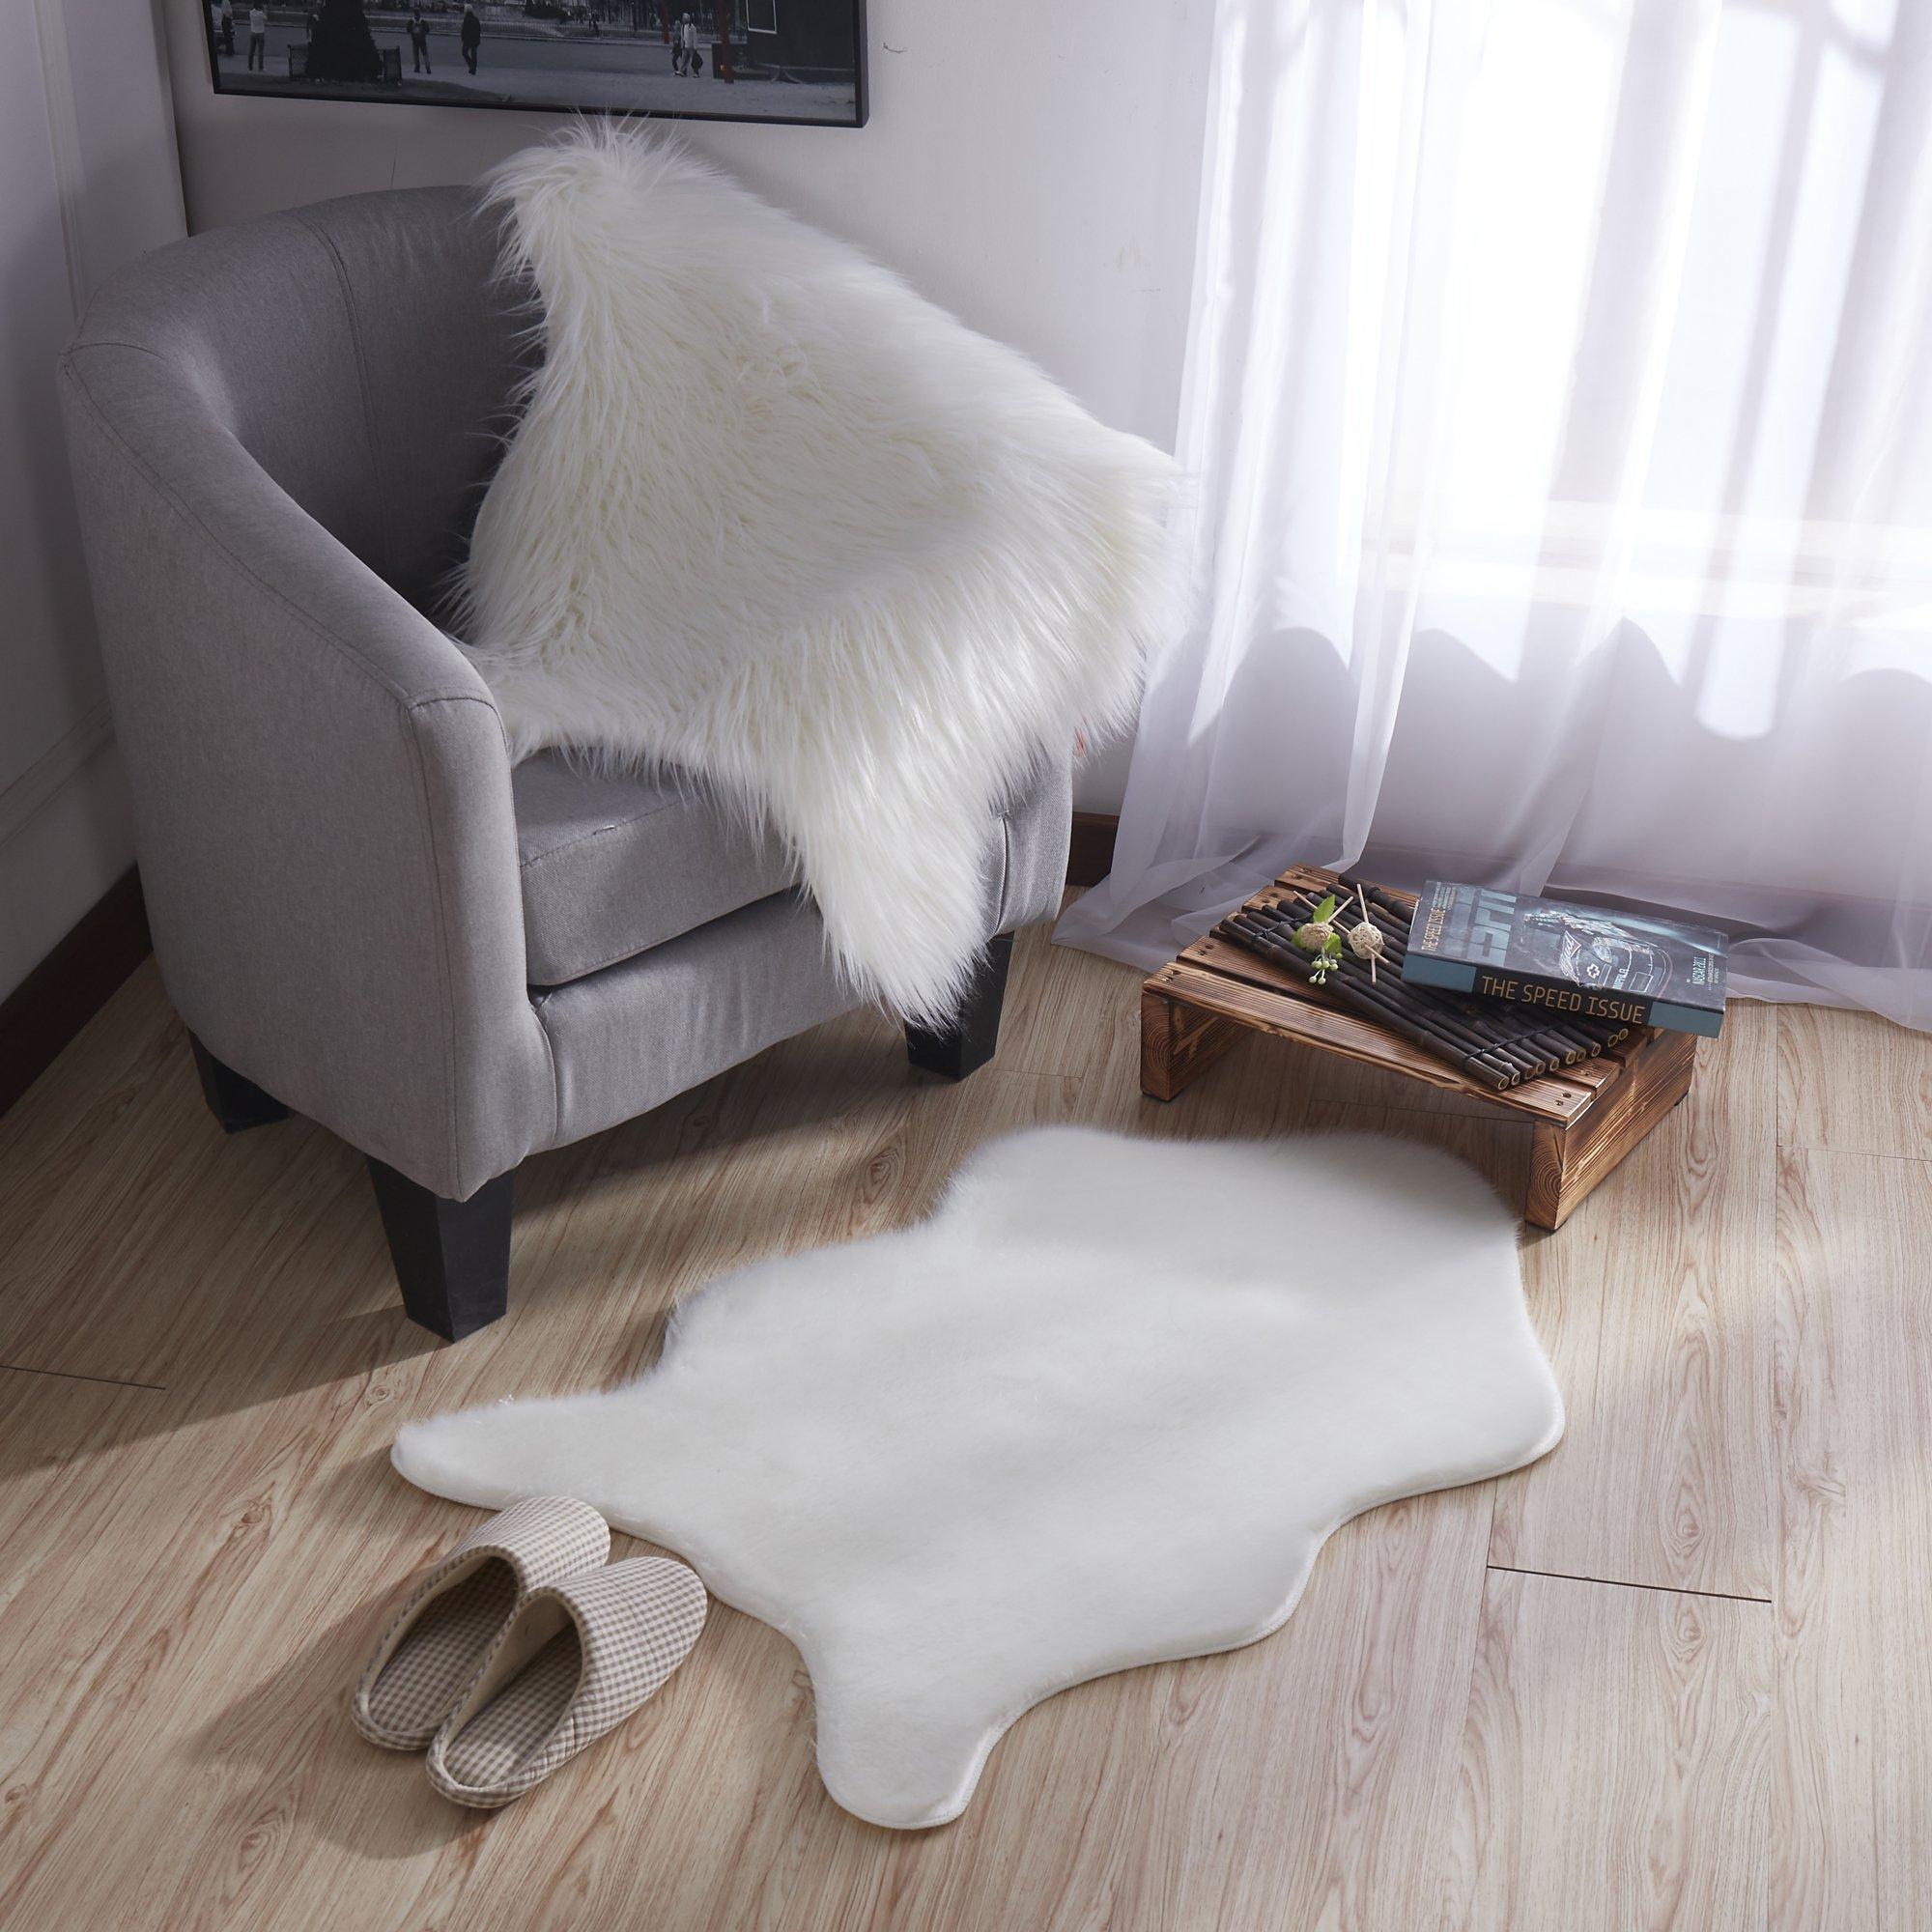 Ottomanson Flokati Short Pile Sheepskin Rug, 2' X 3'3'', White by Ottomanson